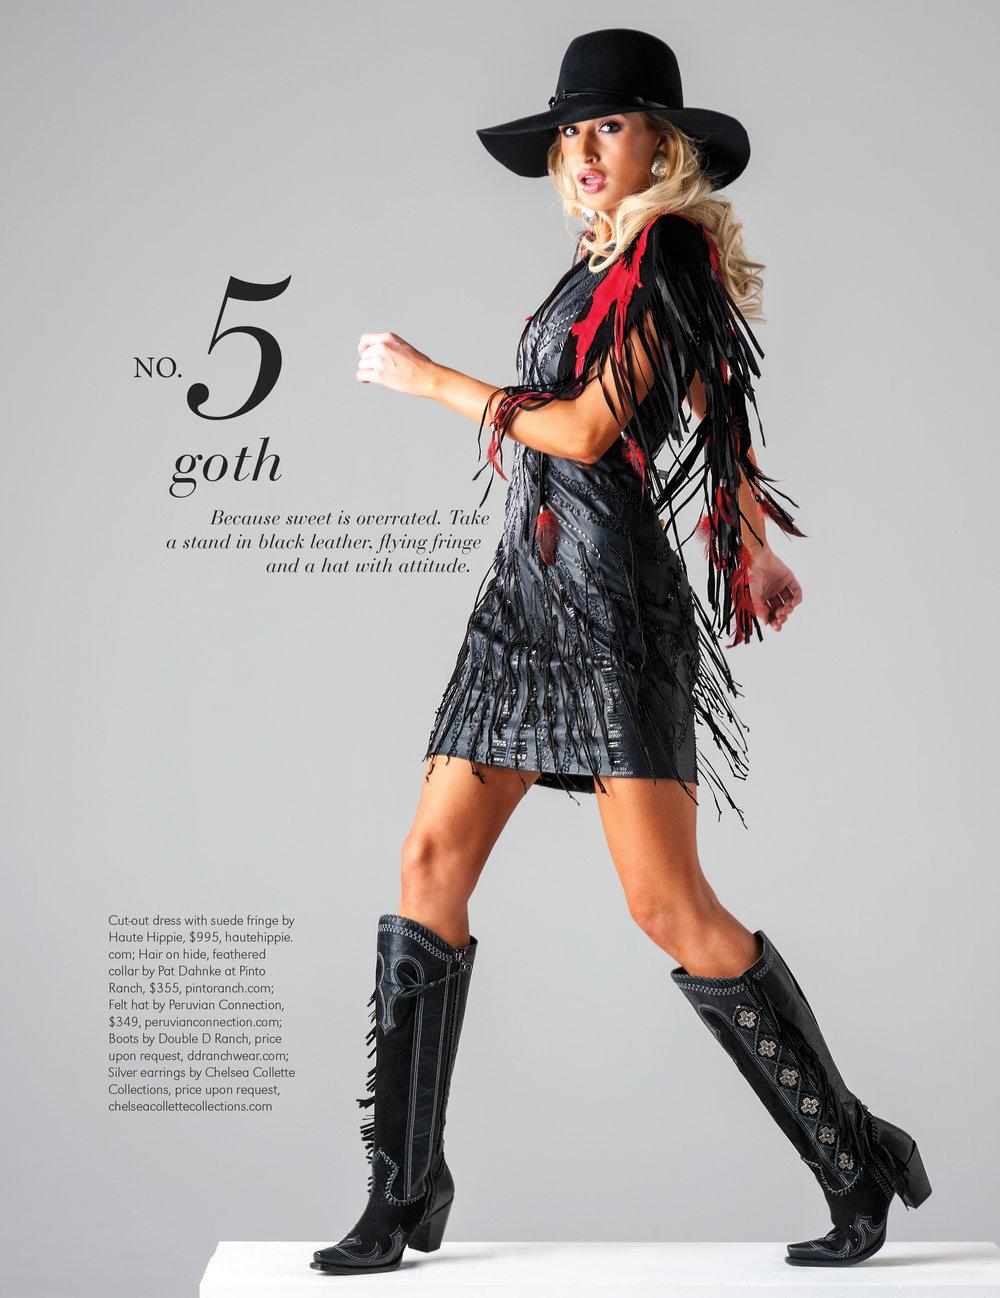 Ken Amorosano - COWGIRL_SEPT15_058-065_Fall-Fashion-2-6.jpg